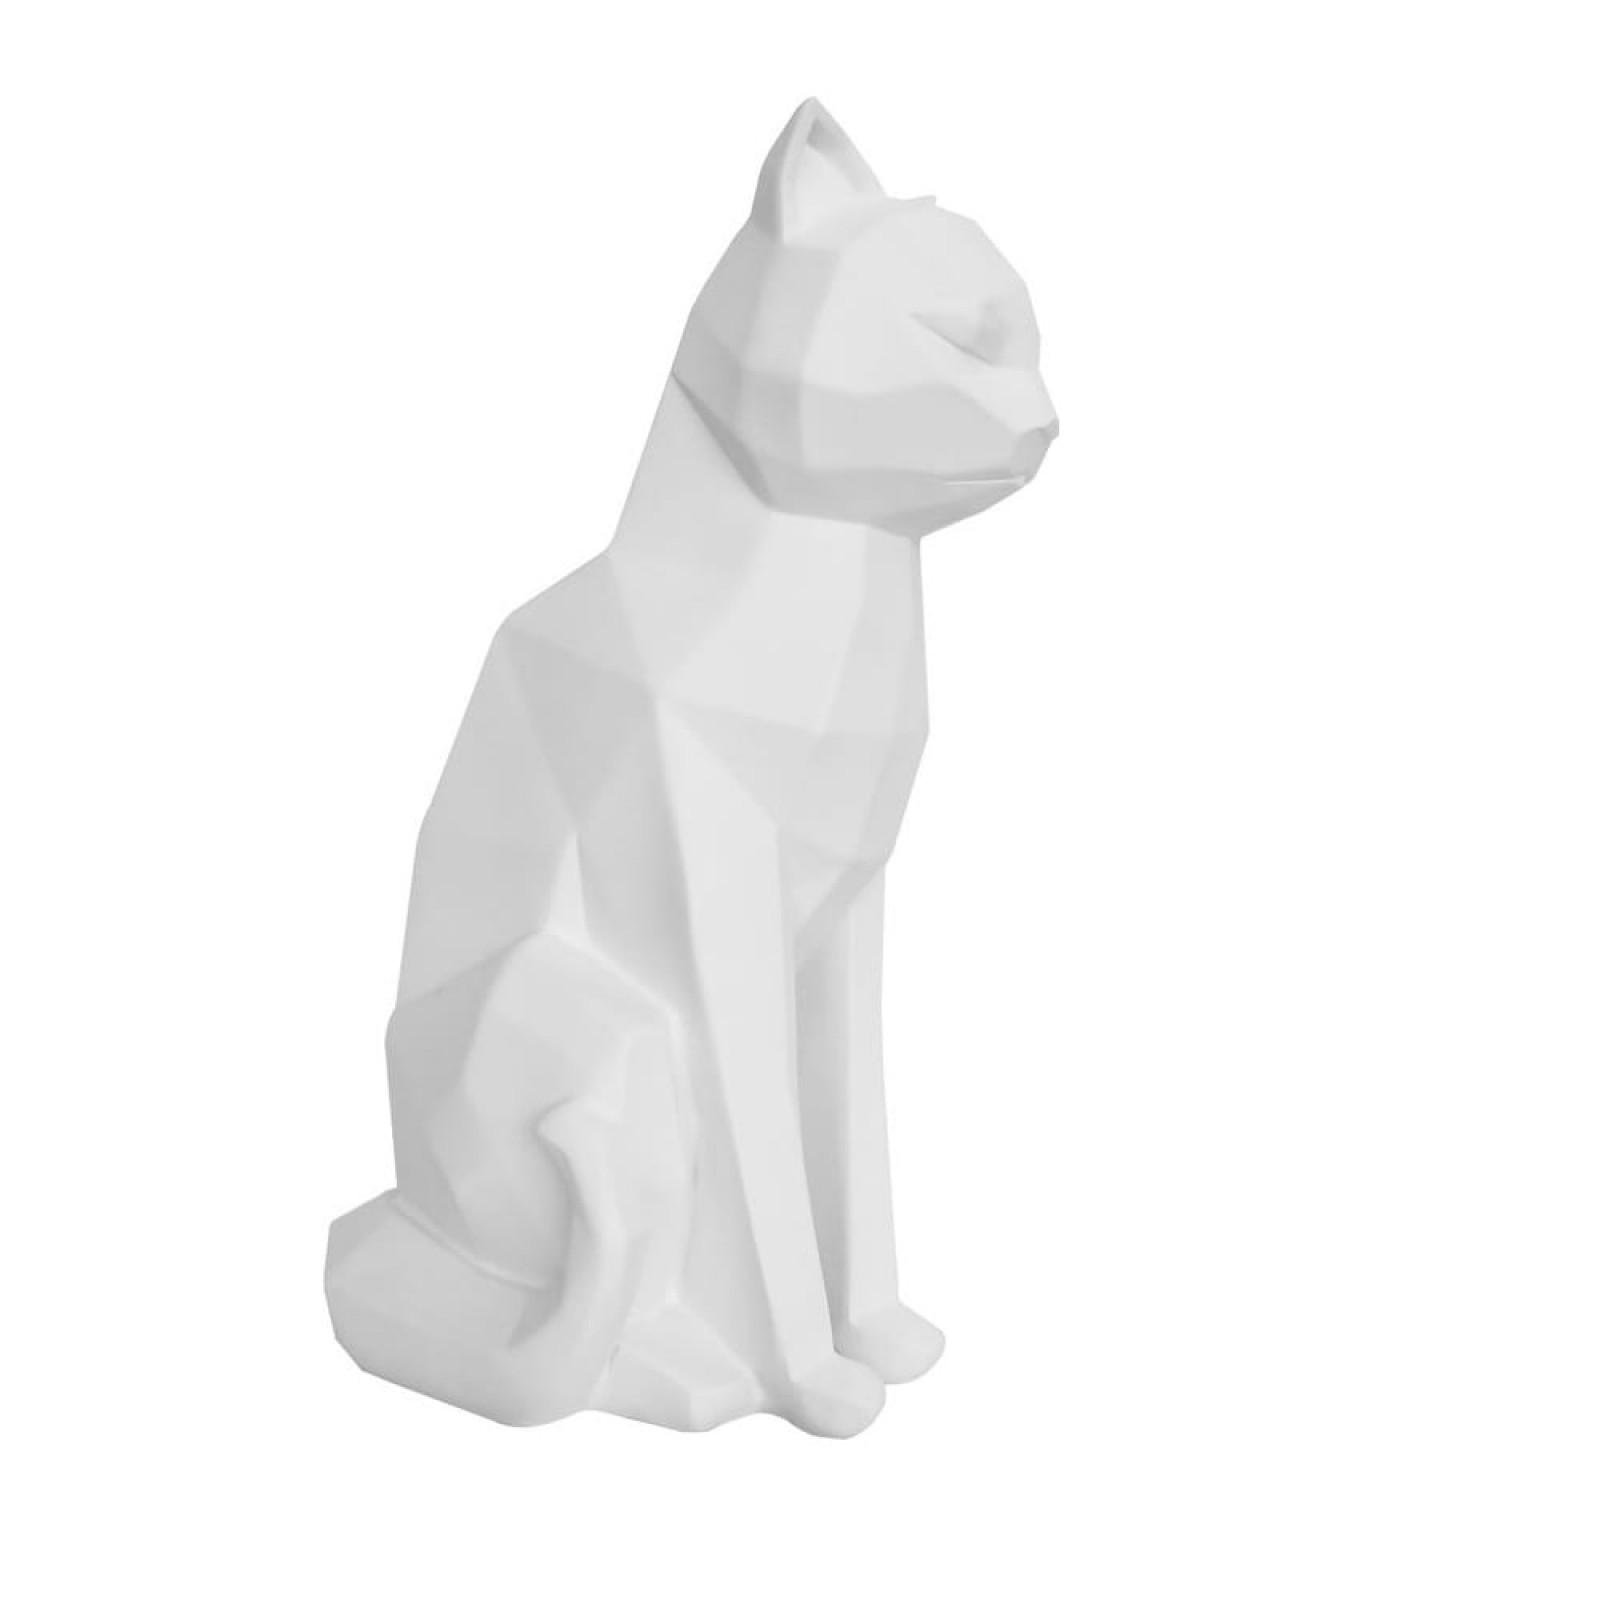 Origami Cat Sitting Statue (White) - Present Time